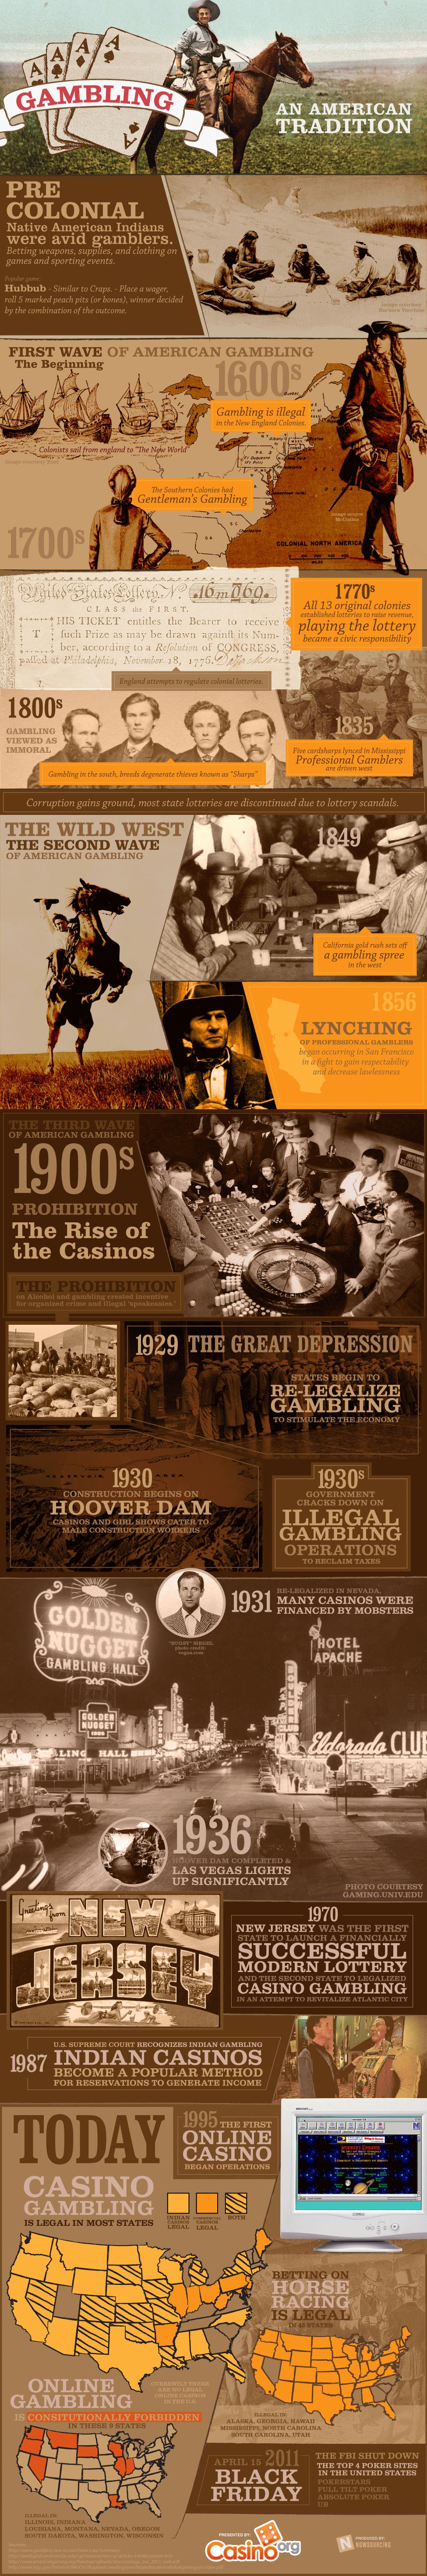 American Gambling History